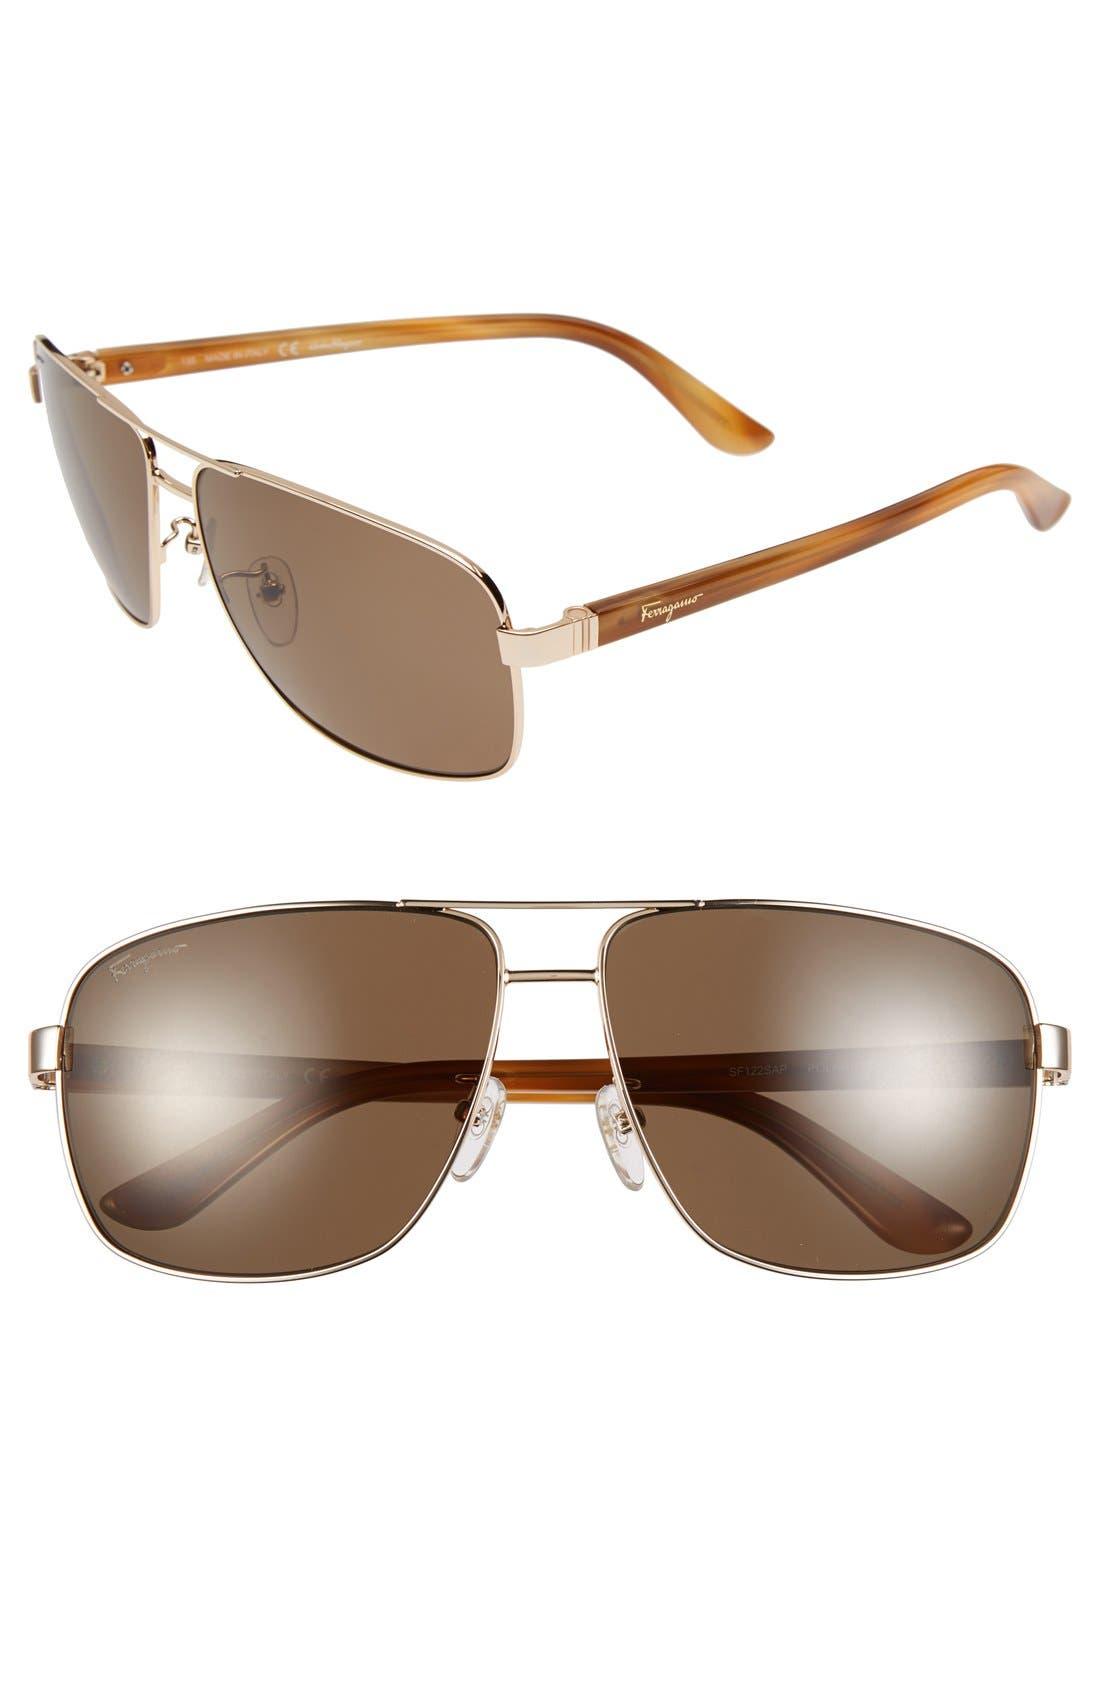 Alternate Image 1 Selected - Salvatore Ferragamo 61mm Polarized Aviator Sunglasses